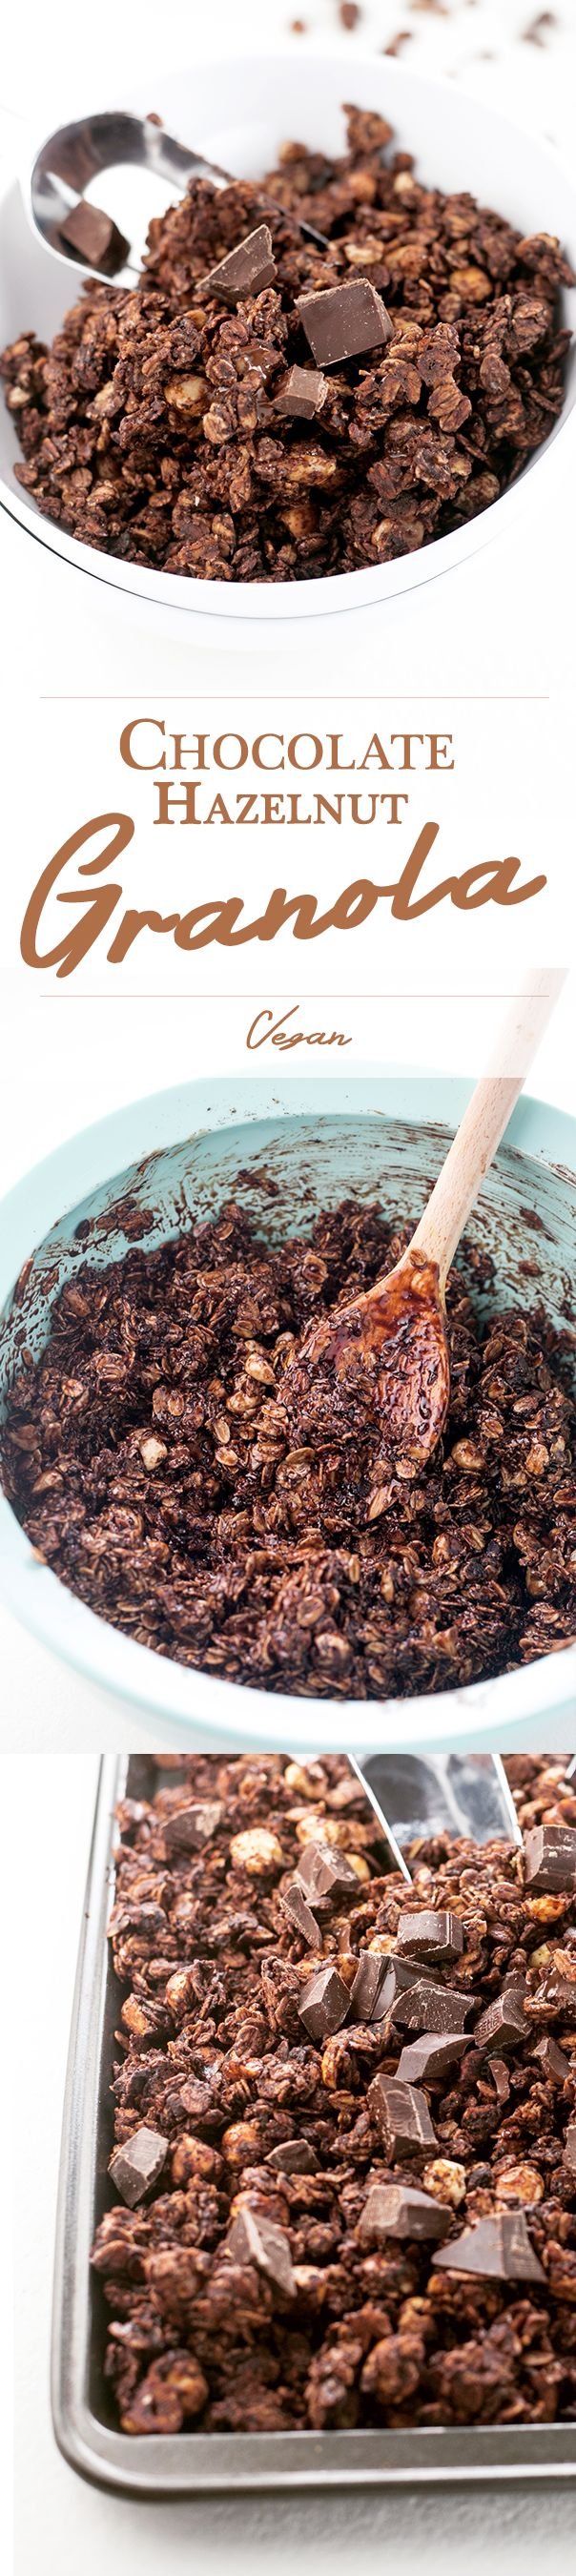 Delicious Chocolate Hazlenut Granola - Vegan, Simple, Delicious. #chocolate #hazelnut #nutella #granola #breakfast #oatmeal